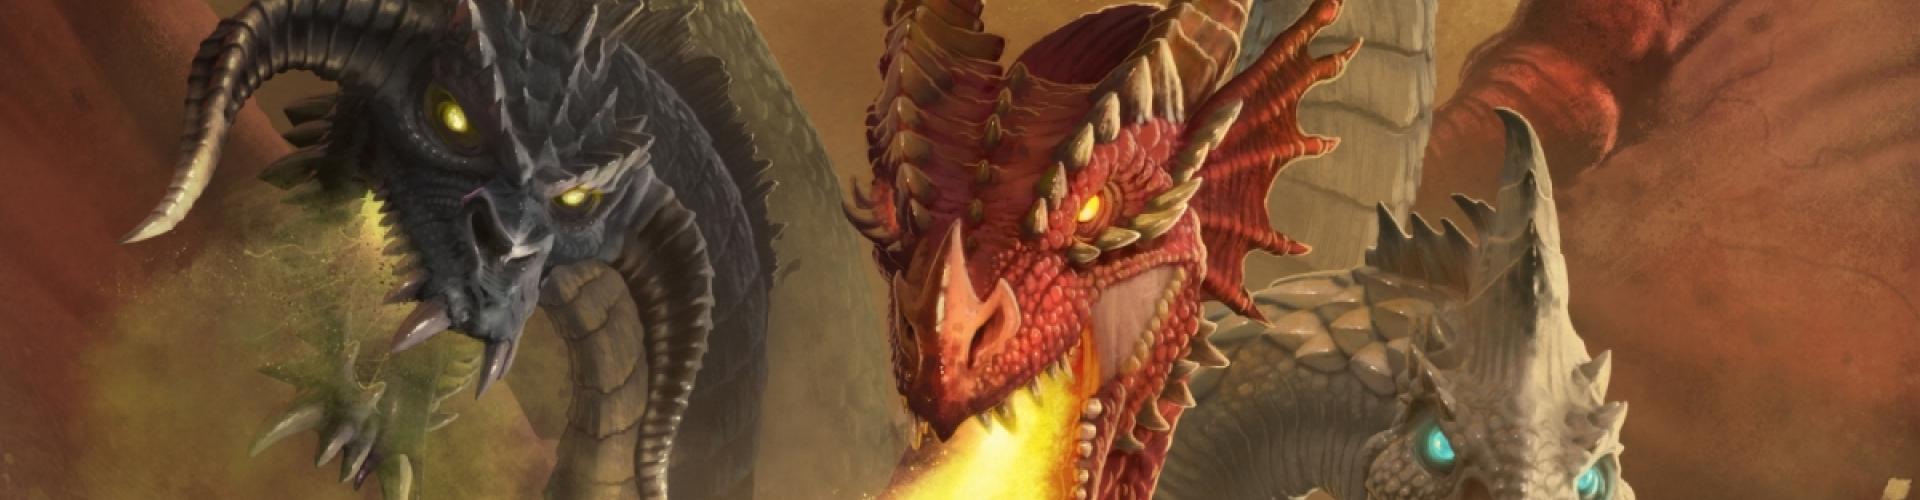 Neverwinter Xbox One Closed Beta